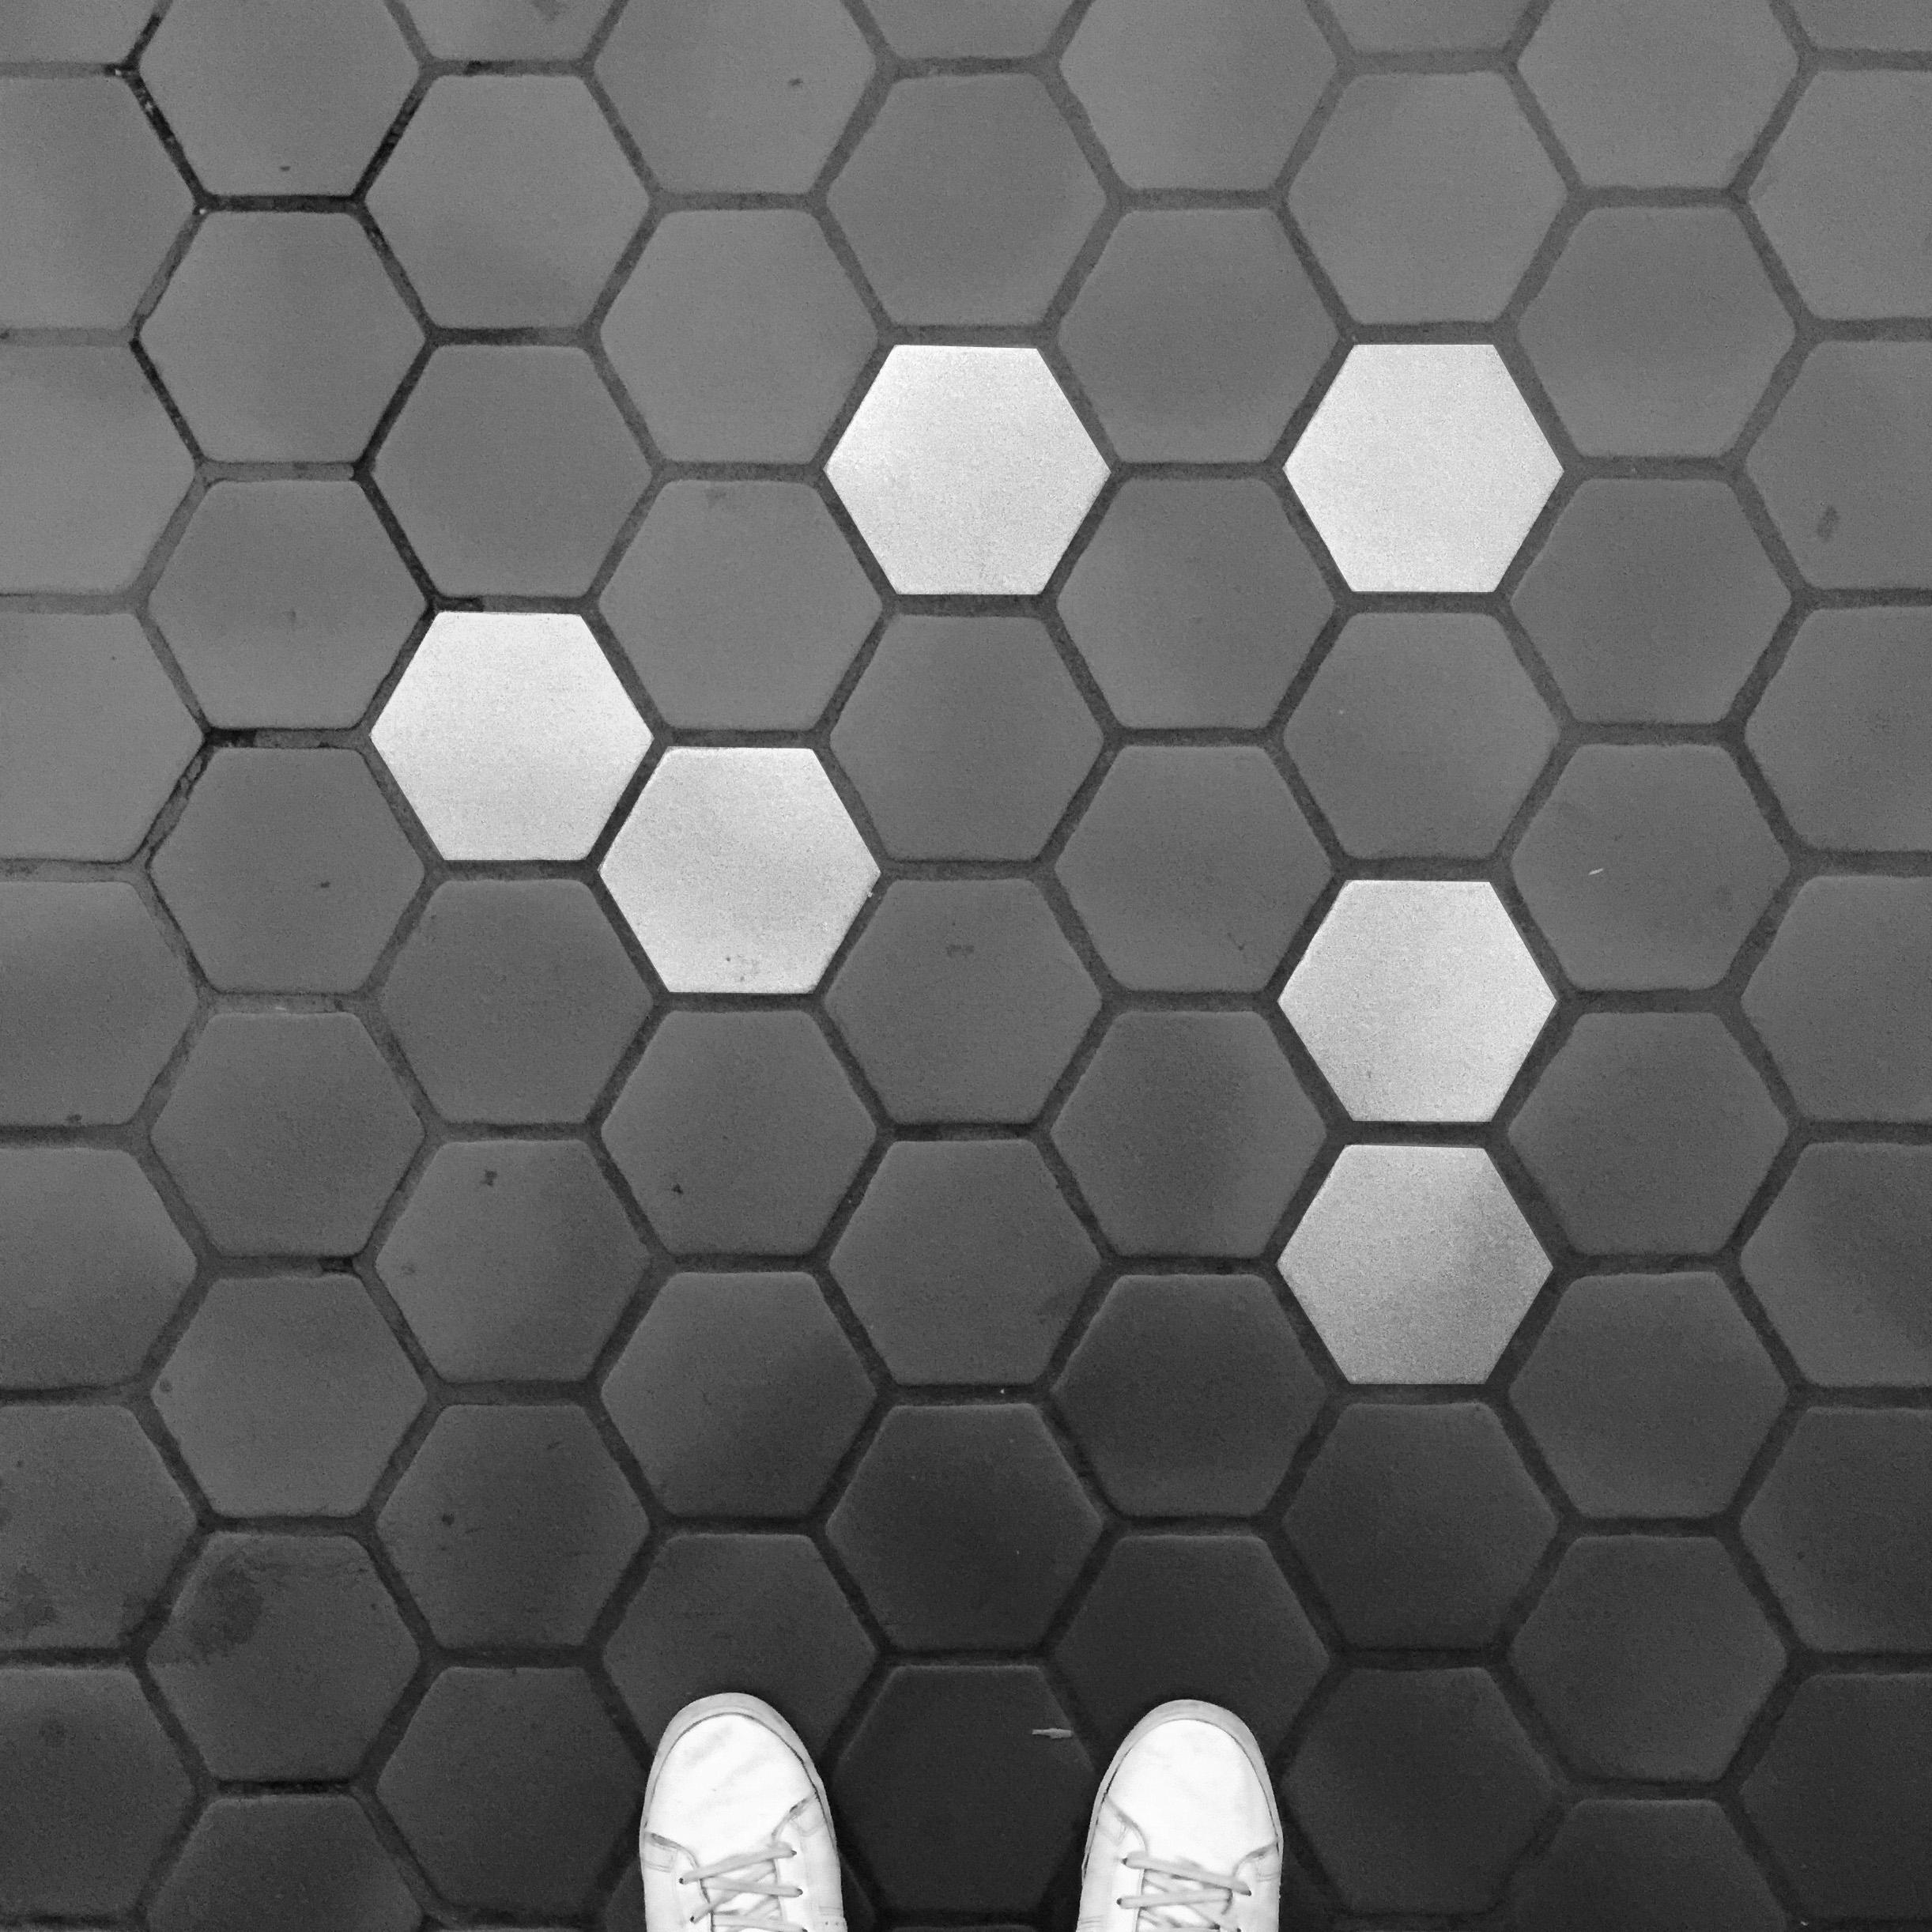 2 square Hi-Metro-Tiles-4-3-17.jpg